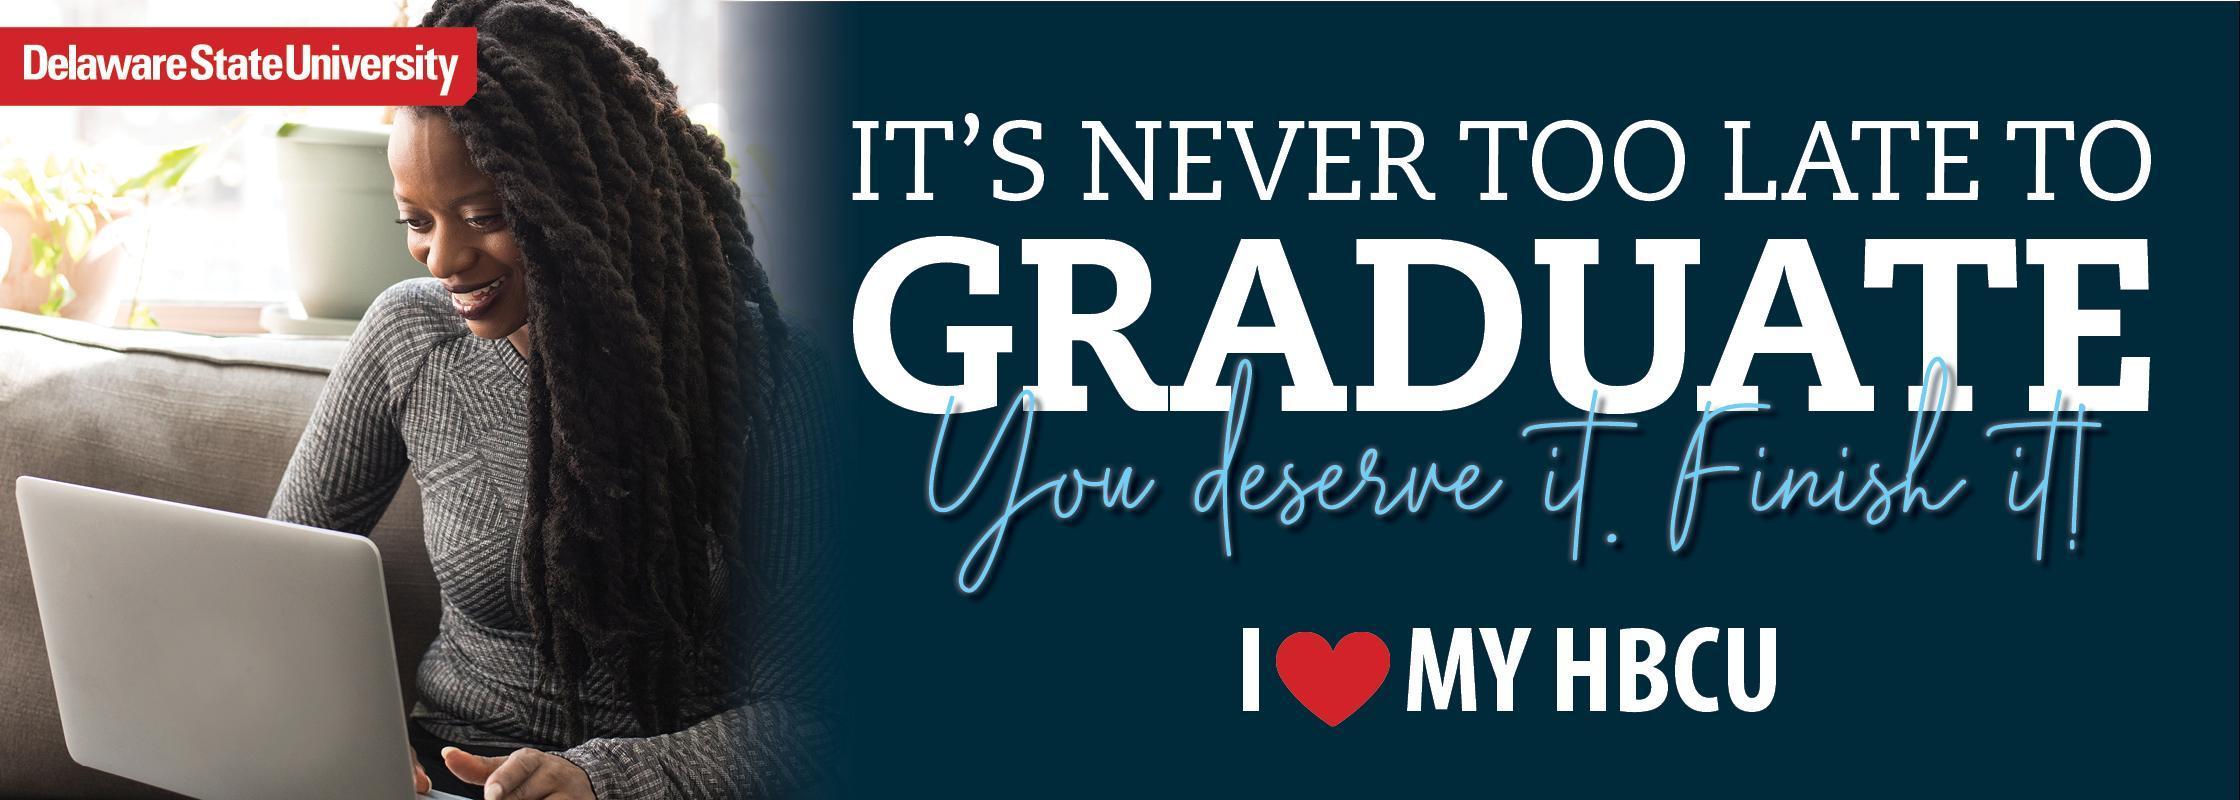 never too late to graduate